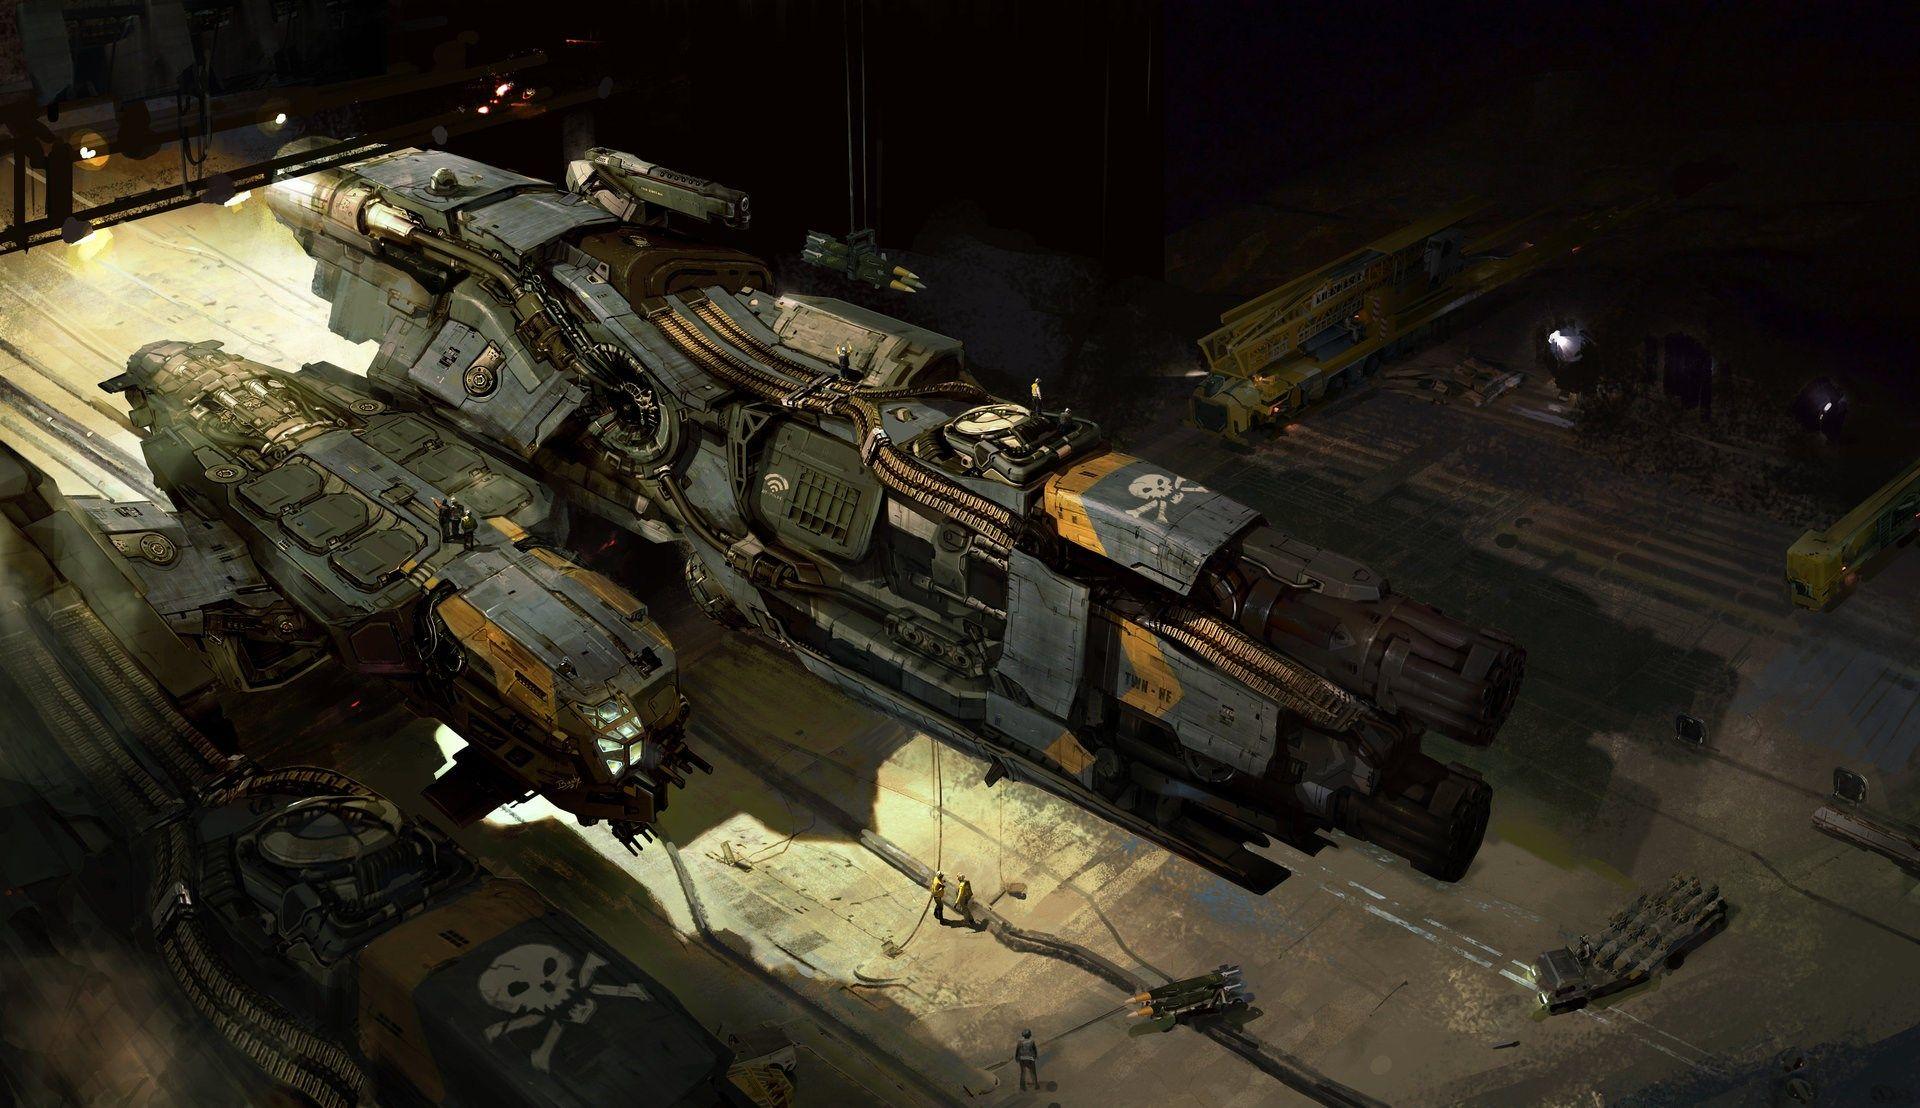 spaceship  - Full HD Wallpaper, Photo